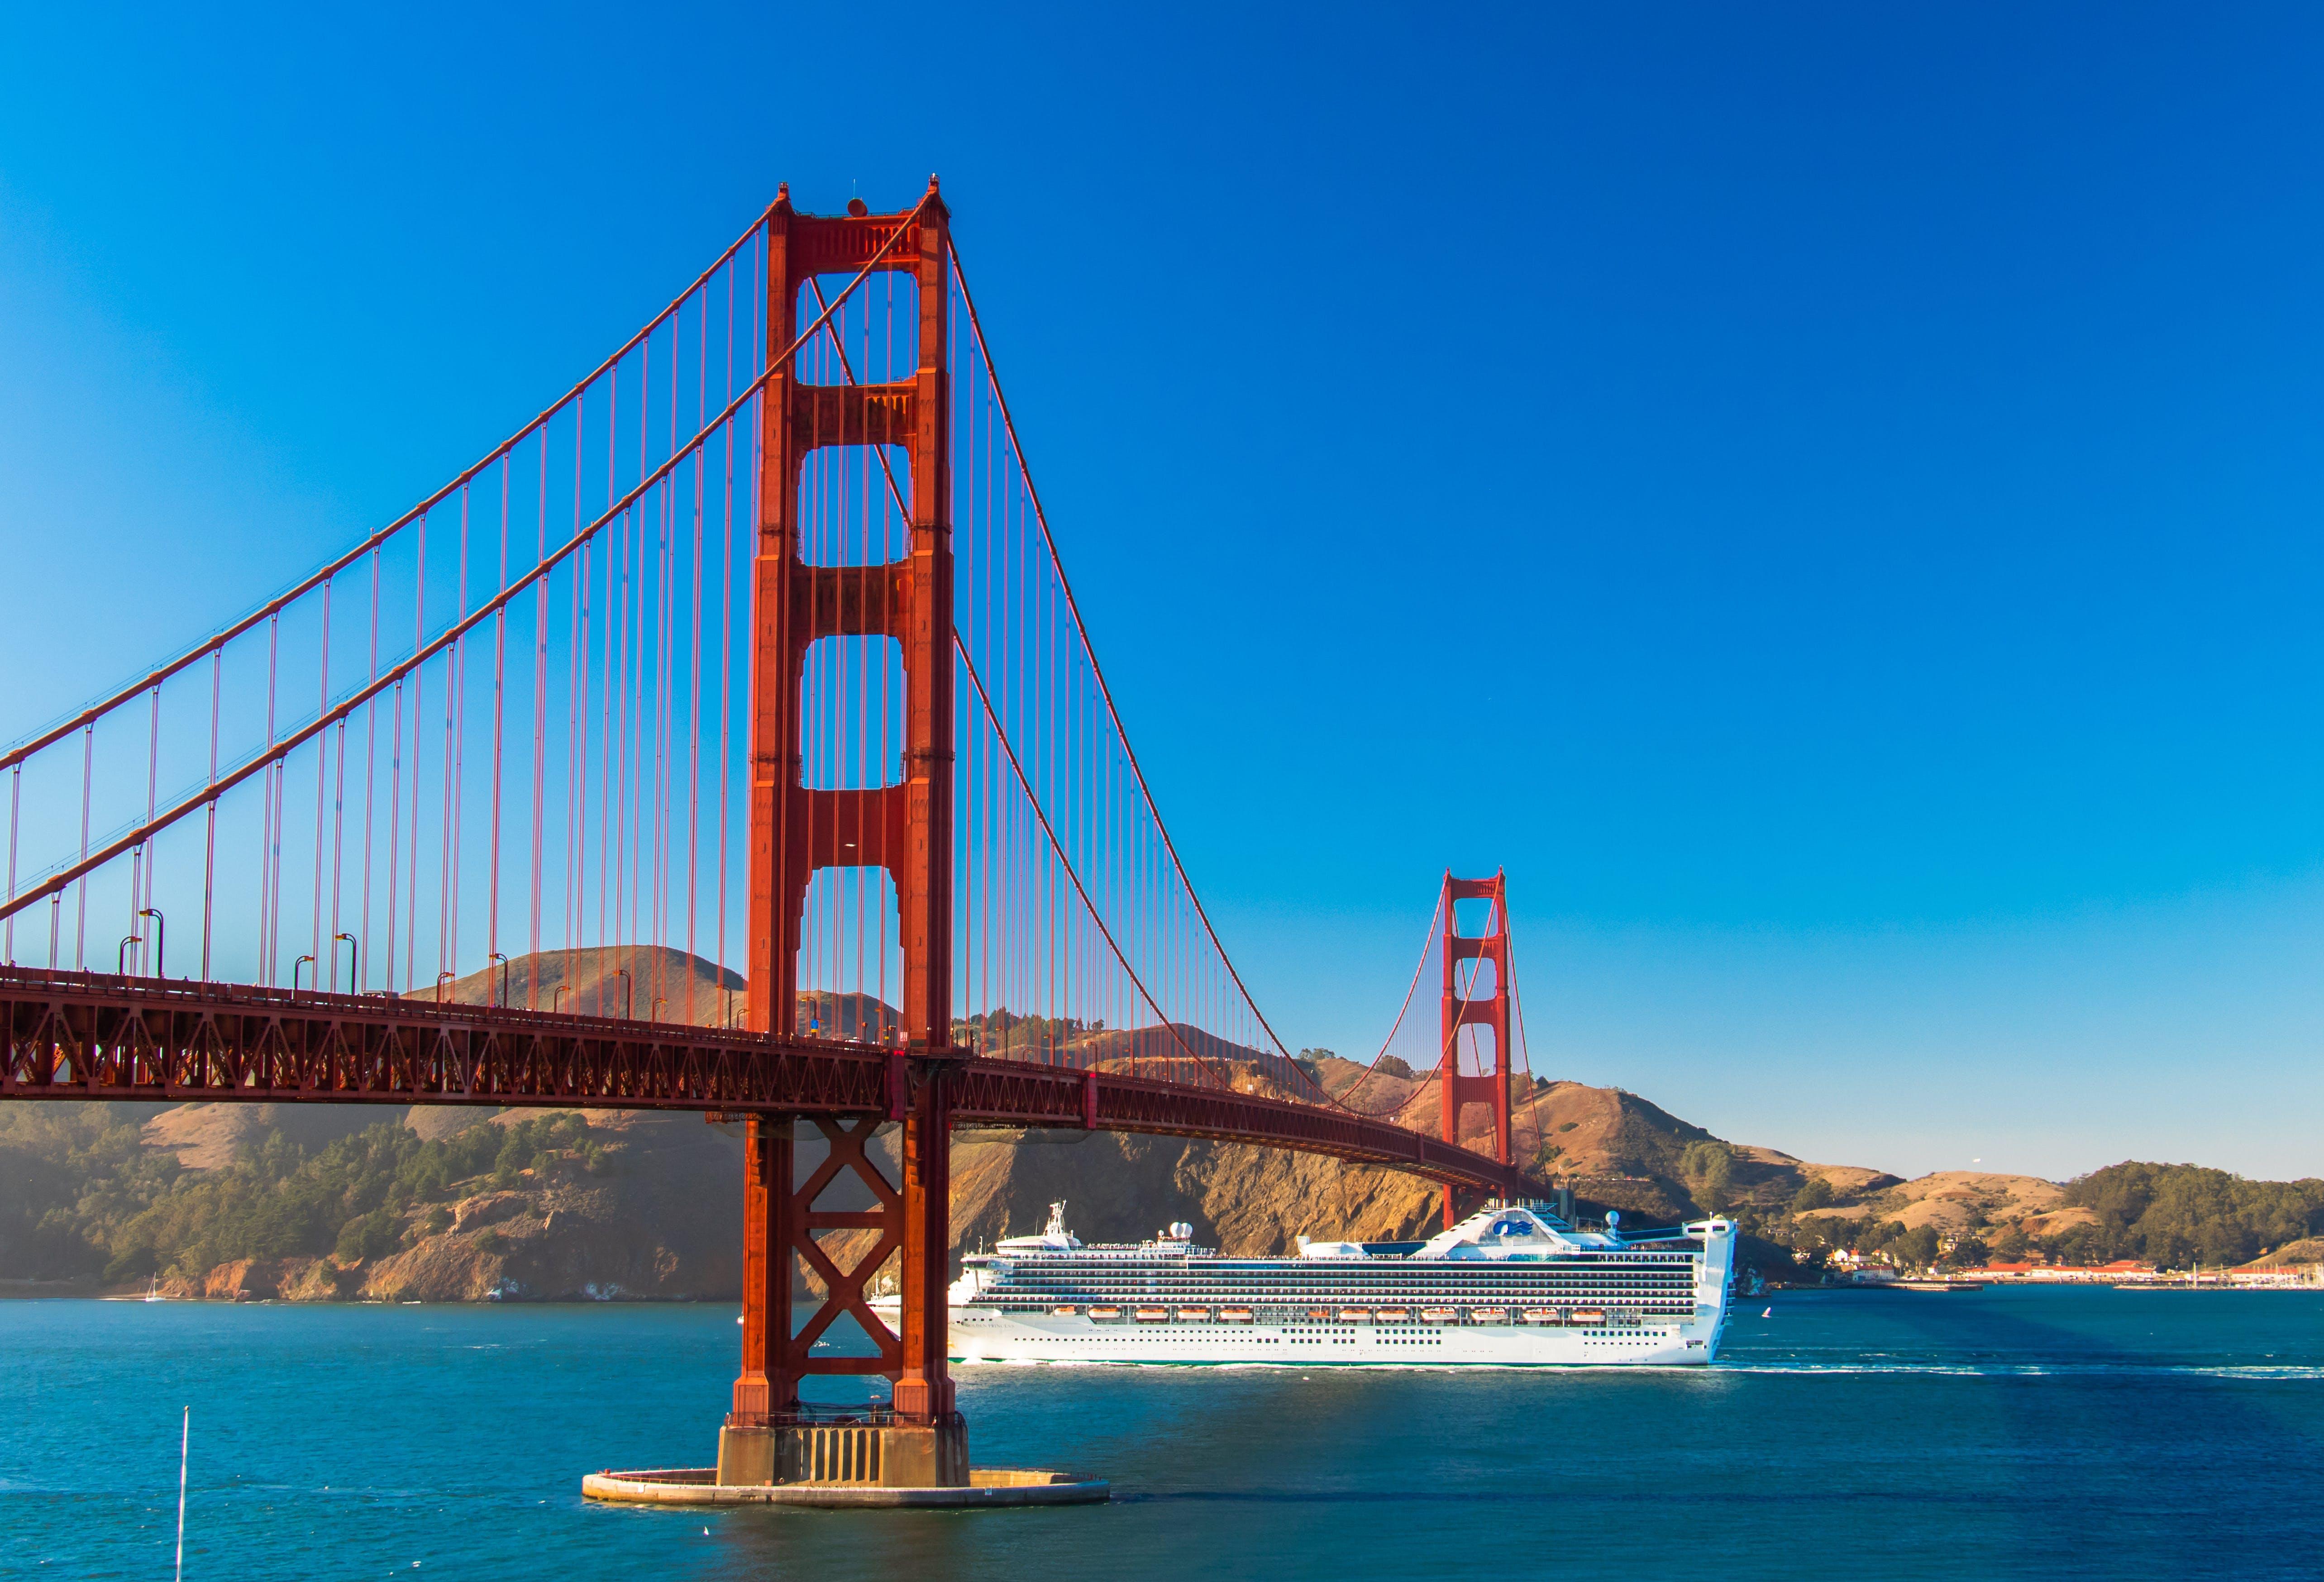 Free stock photo of architecture, blue sky, bridge, cruise